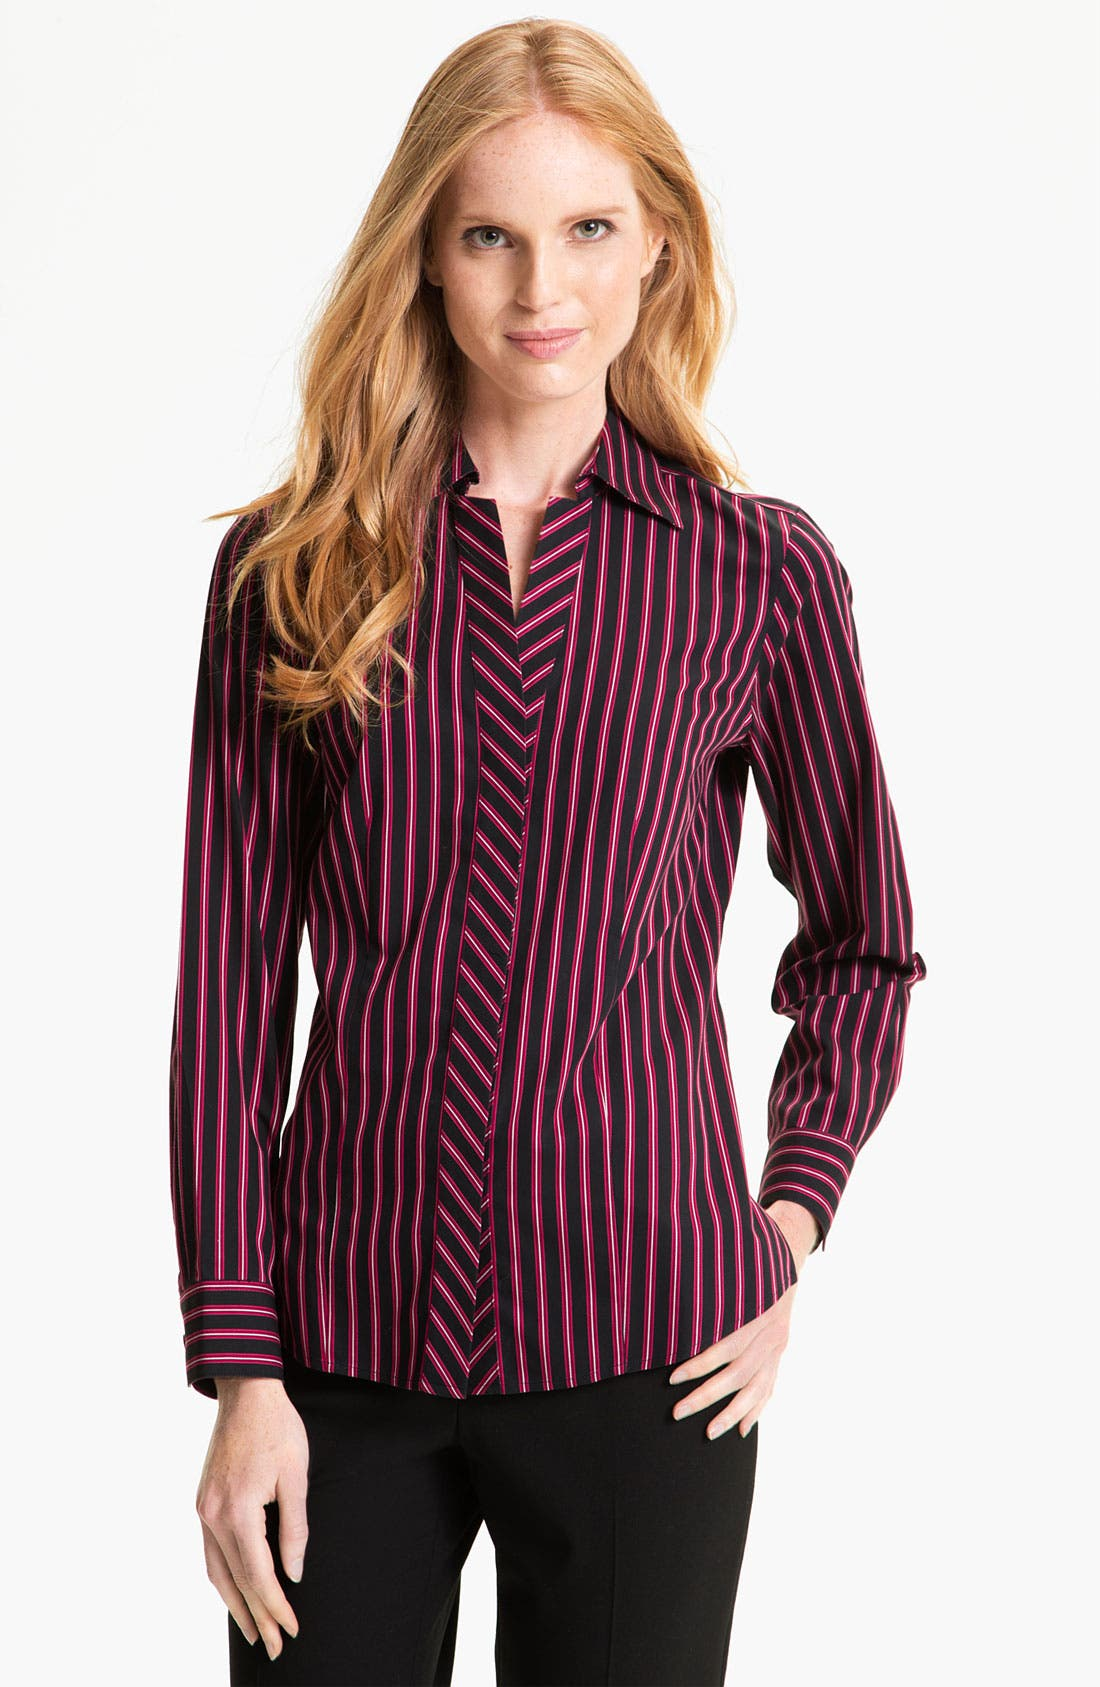 Alternate Image 1 Selected - Foxcroft Satin Stripe Shirt (Petite)